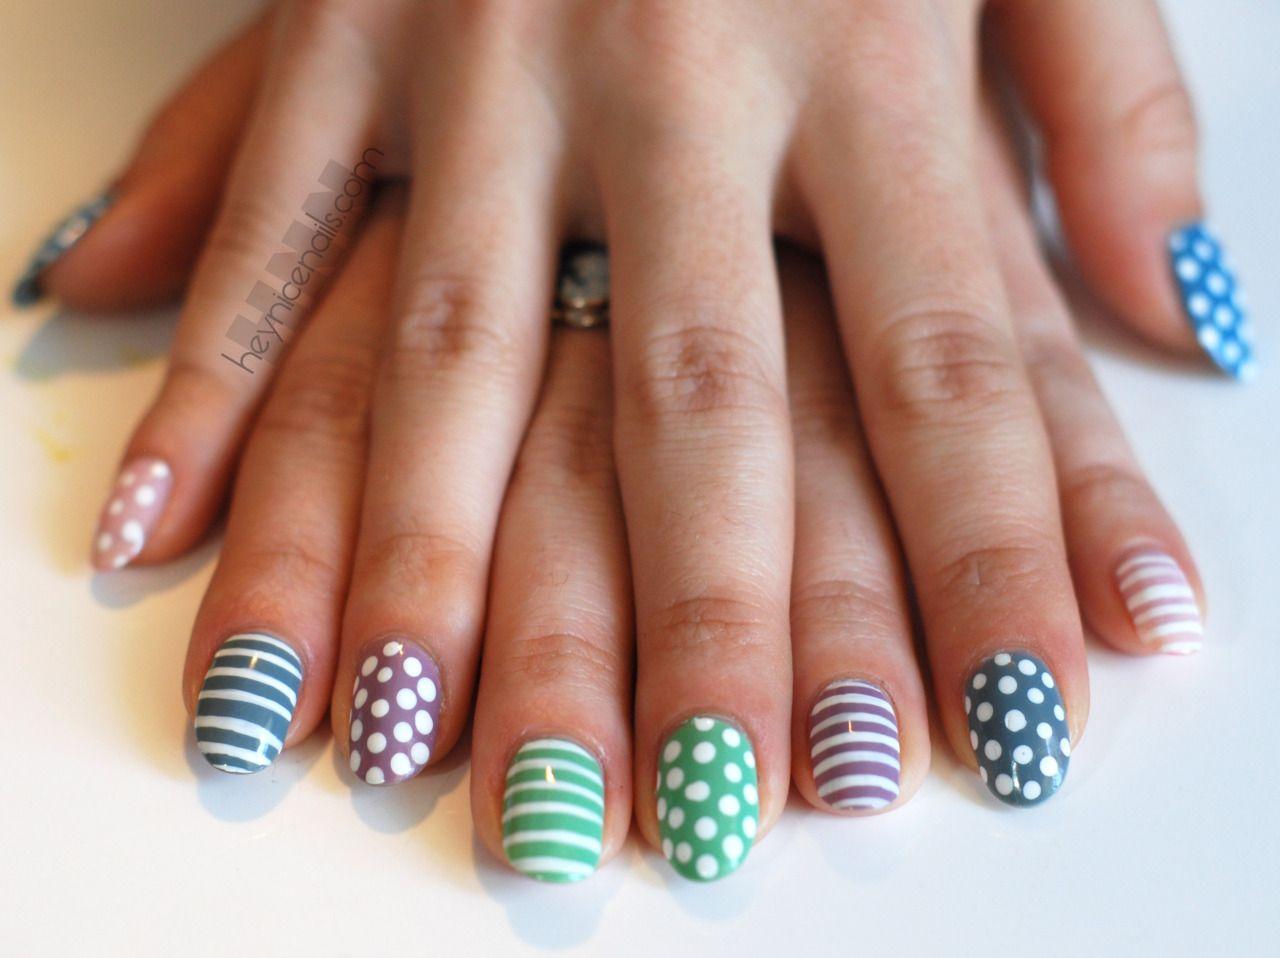 Lampe Uv Ongles L Indispensable Pour Votre Manucure Trendy Nails Hair And Nails Nails